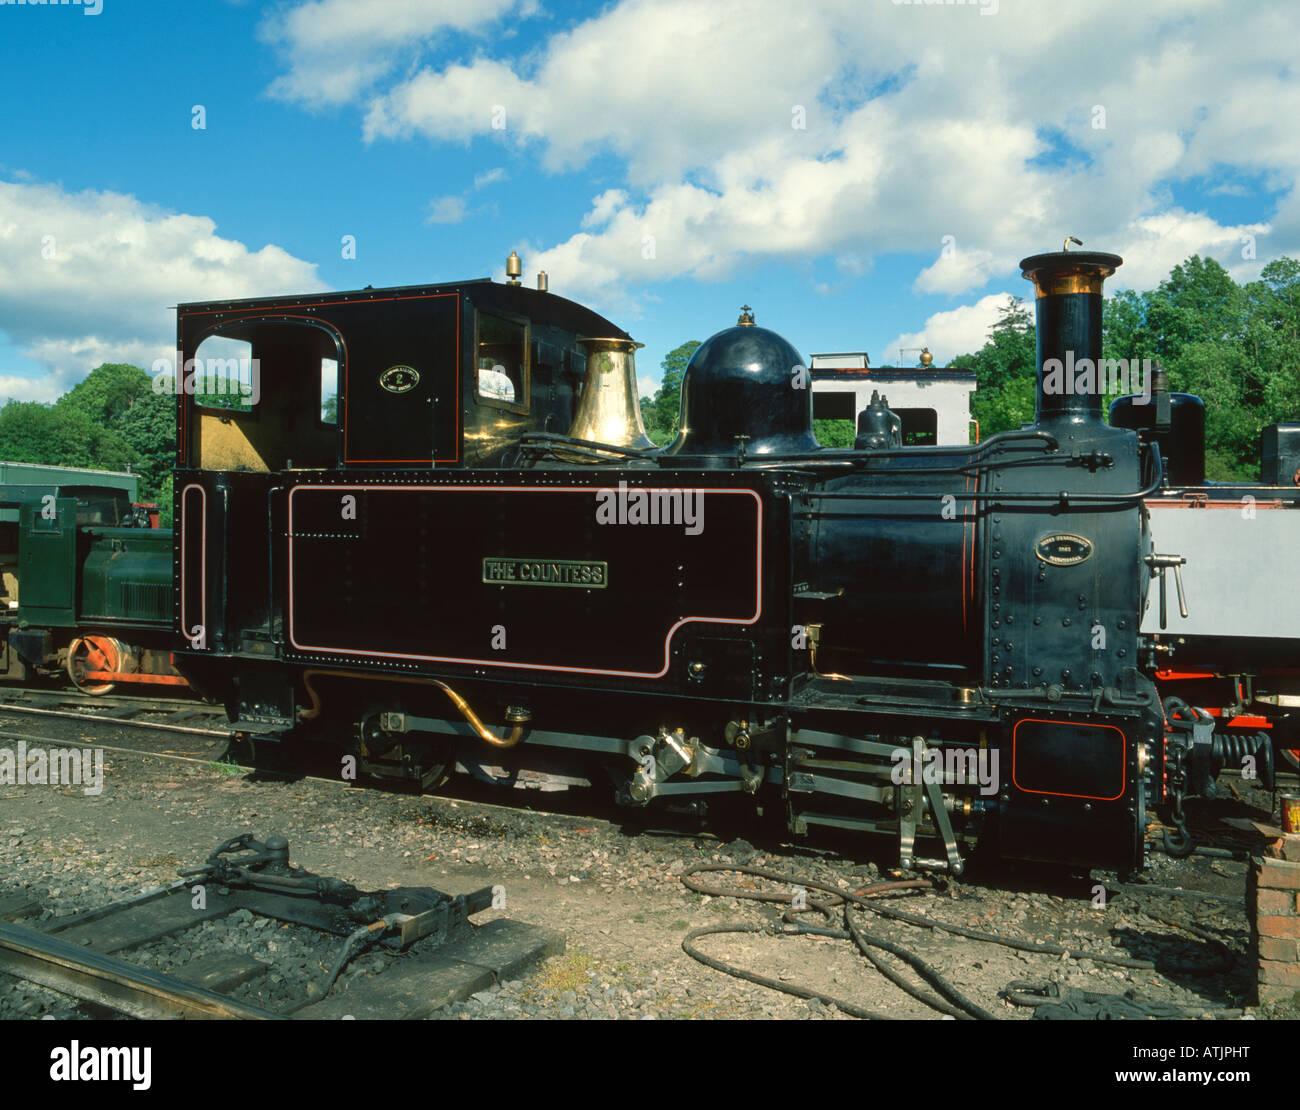 'The Countess' steam locomotive, Wales, UK. - Stock Image